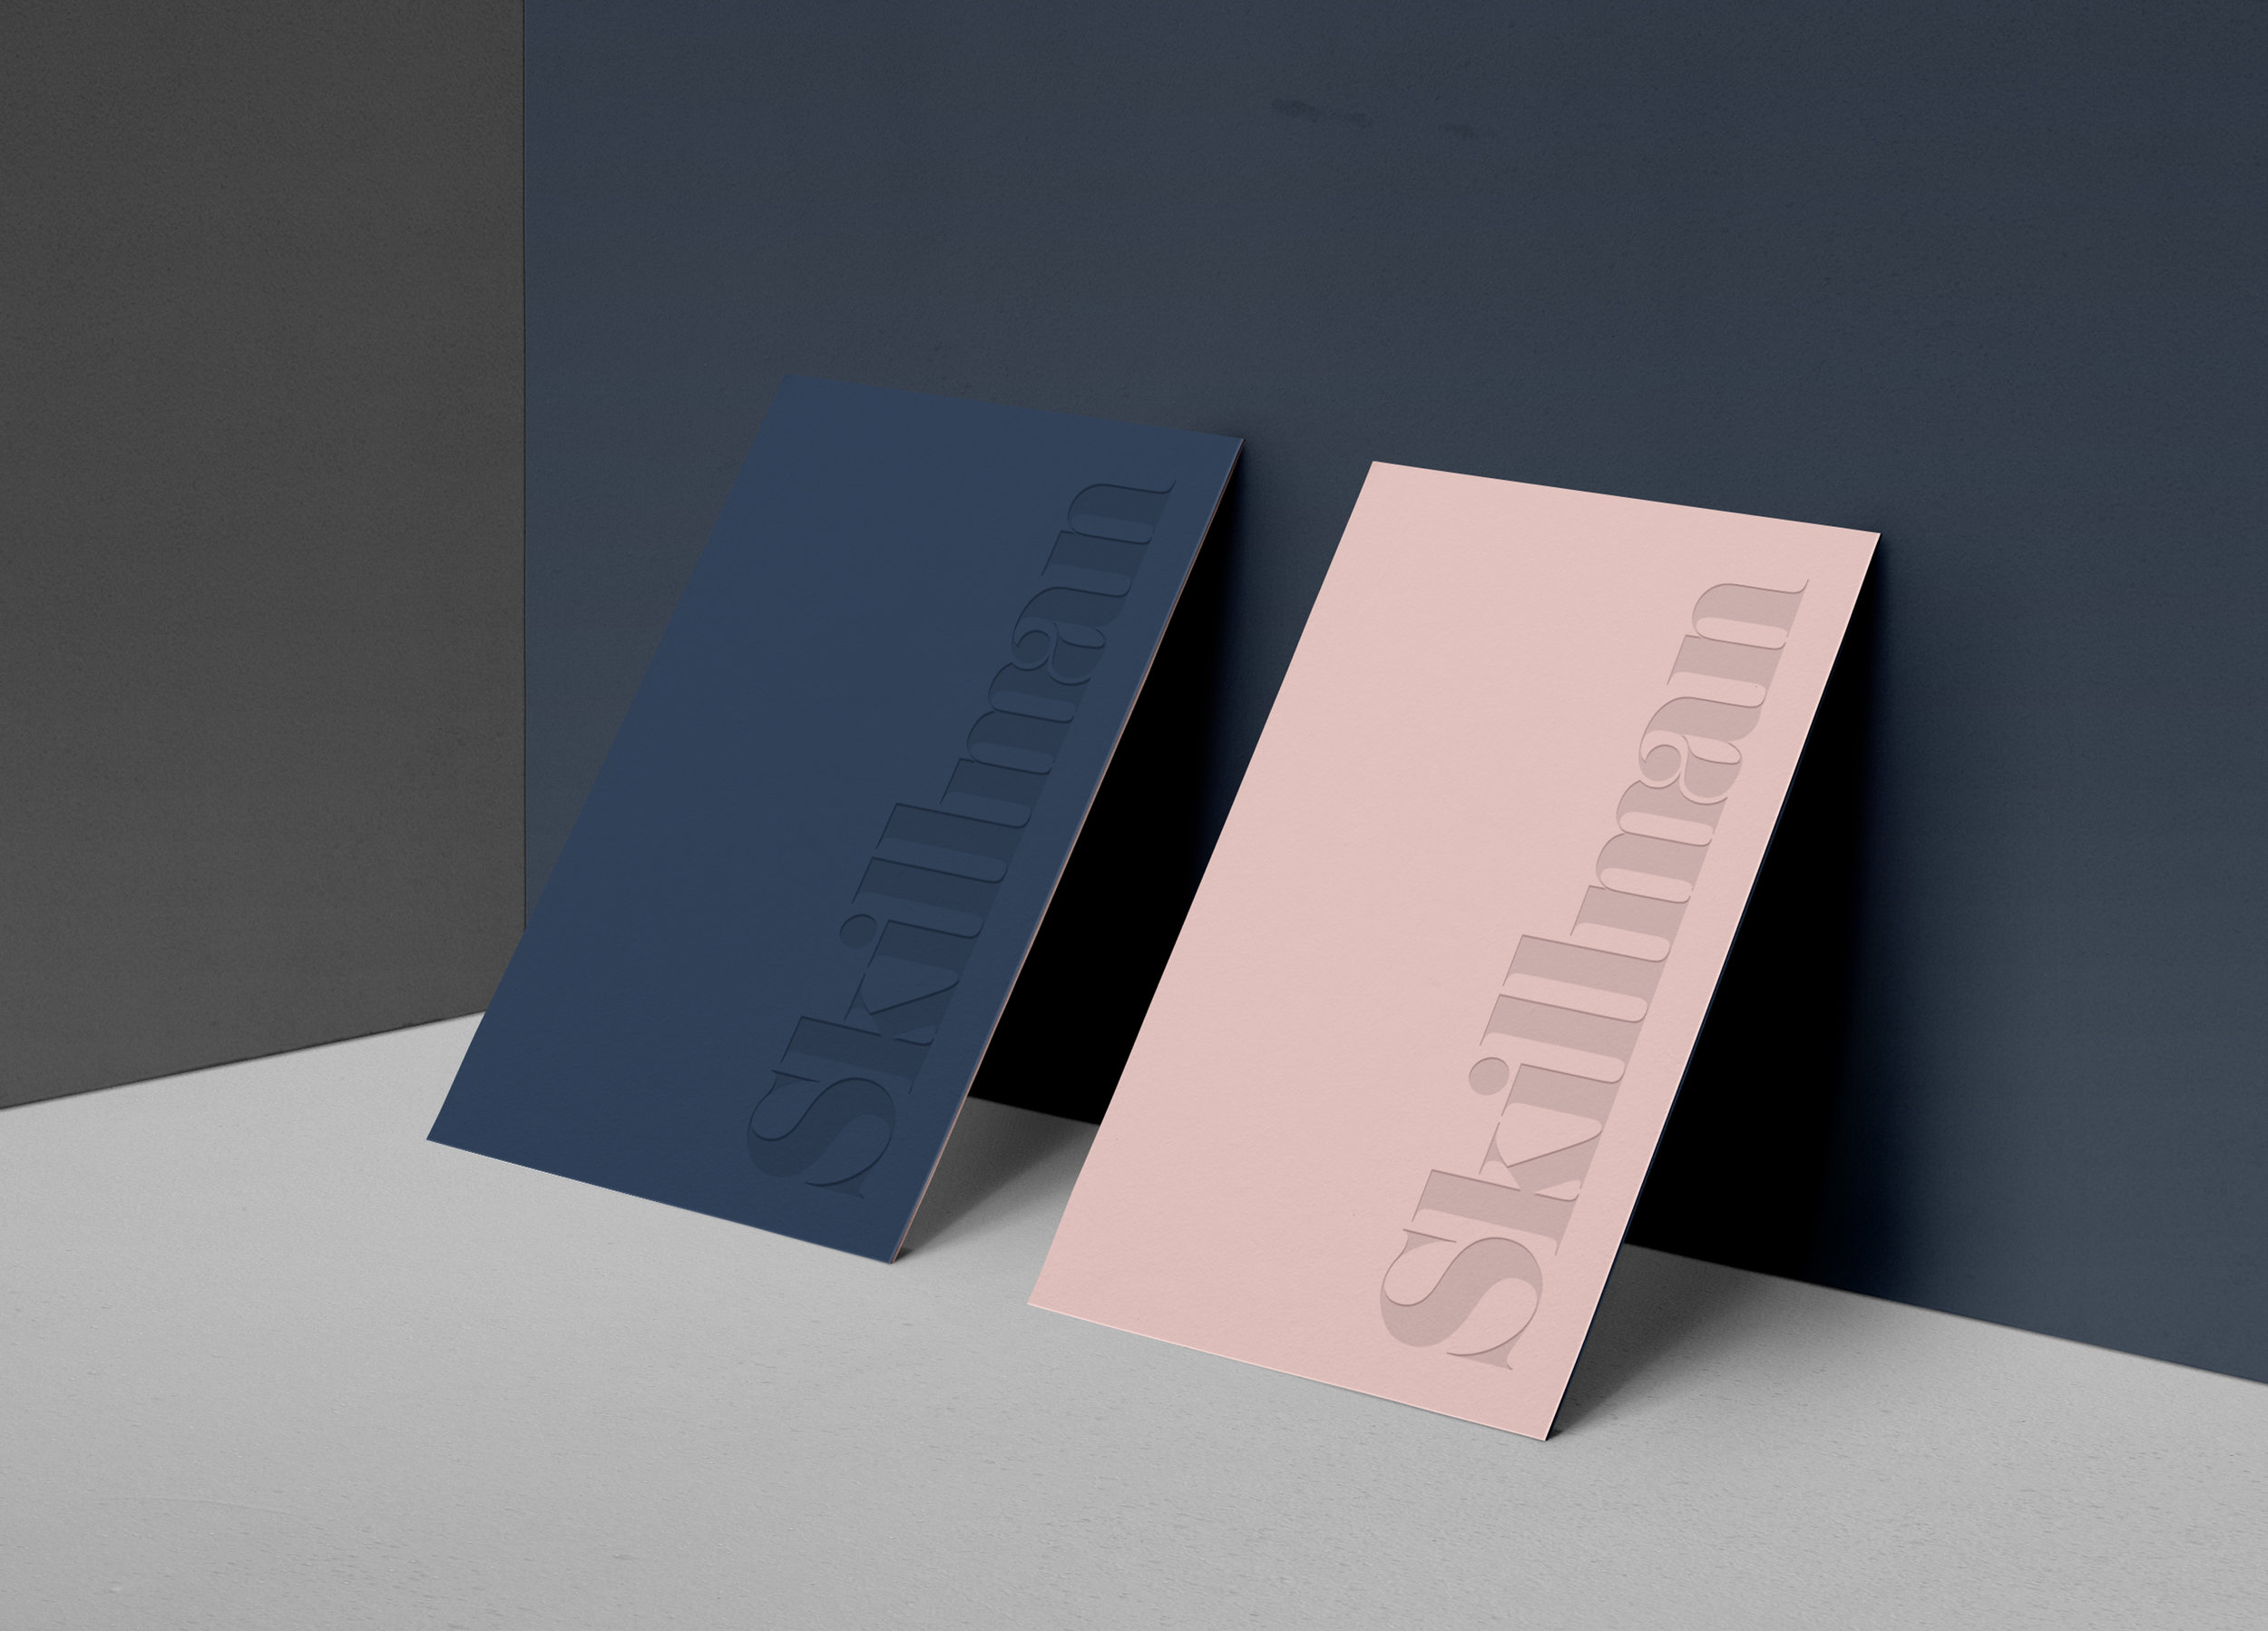 Studio_Bloq-Skillman-4.jpg